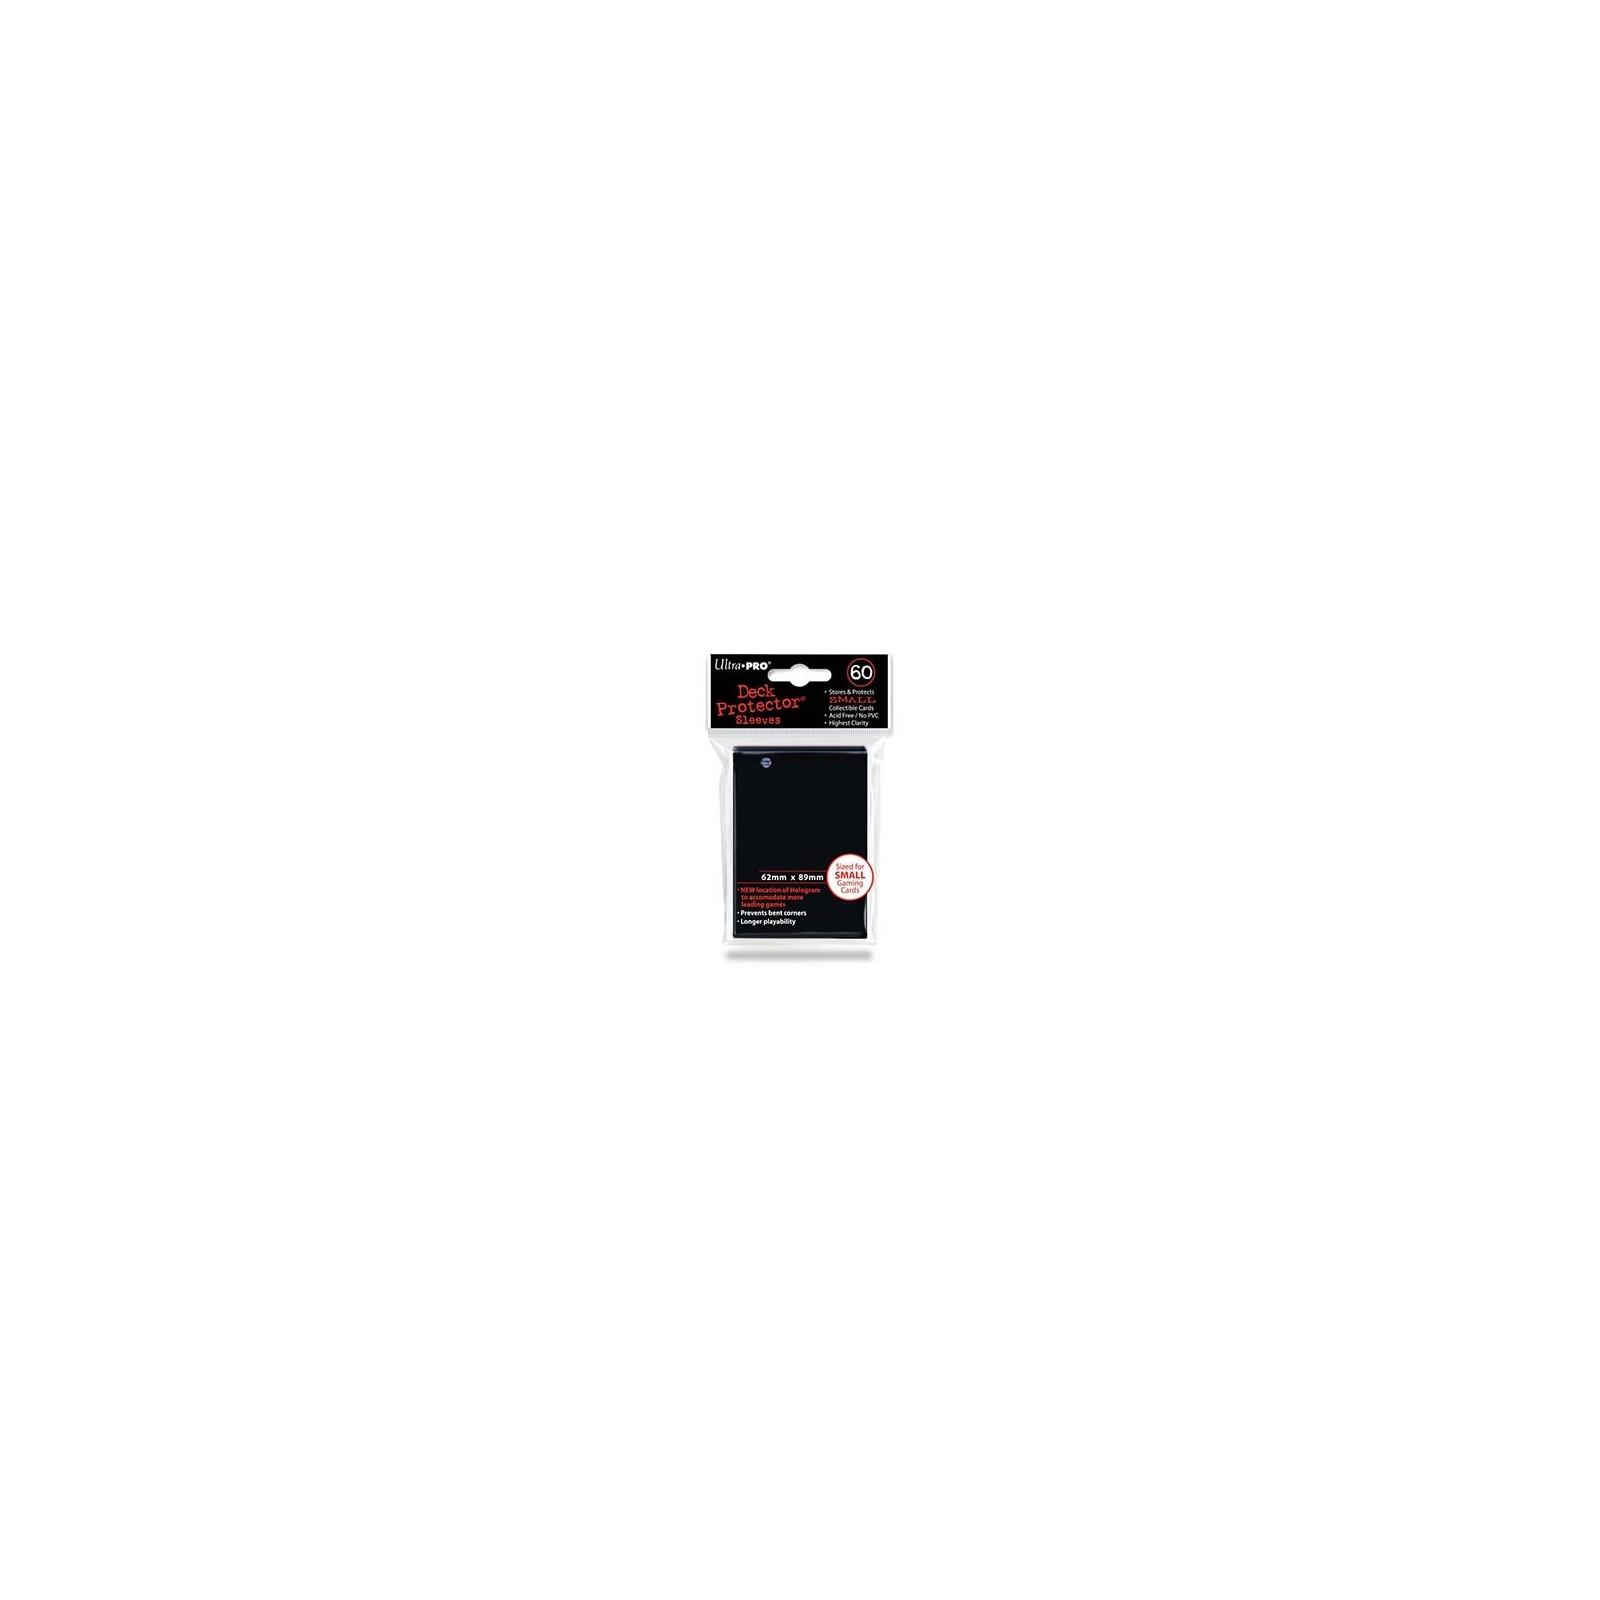 Proteges Cartes - Small Noir (60)